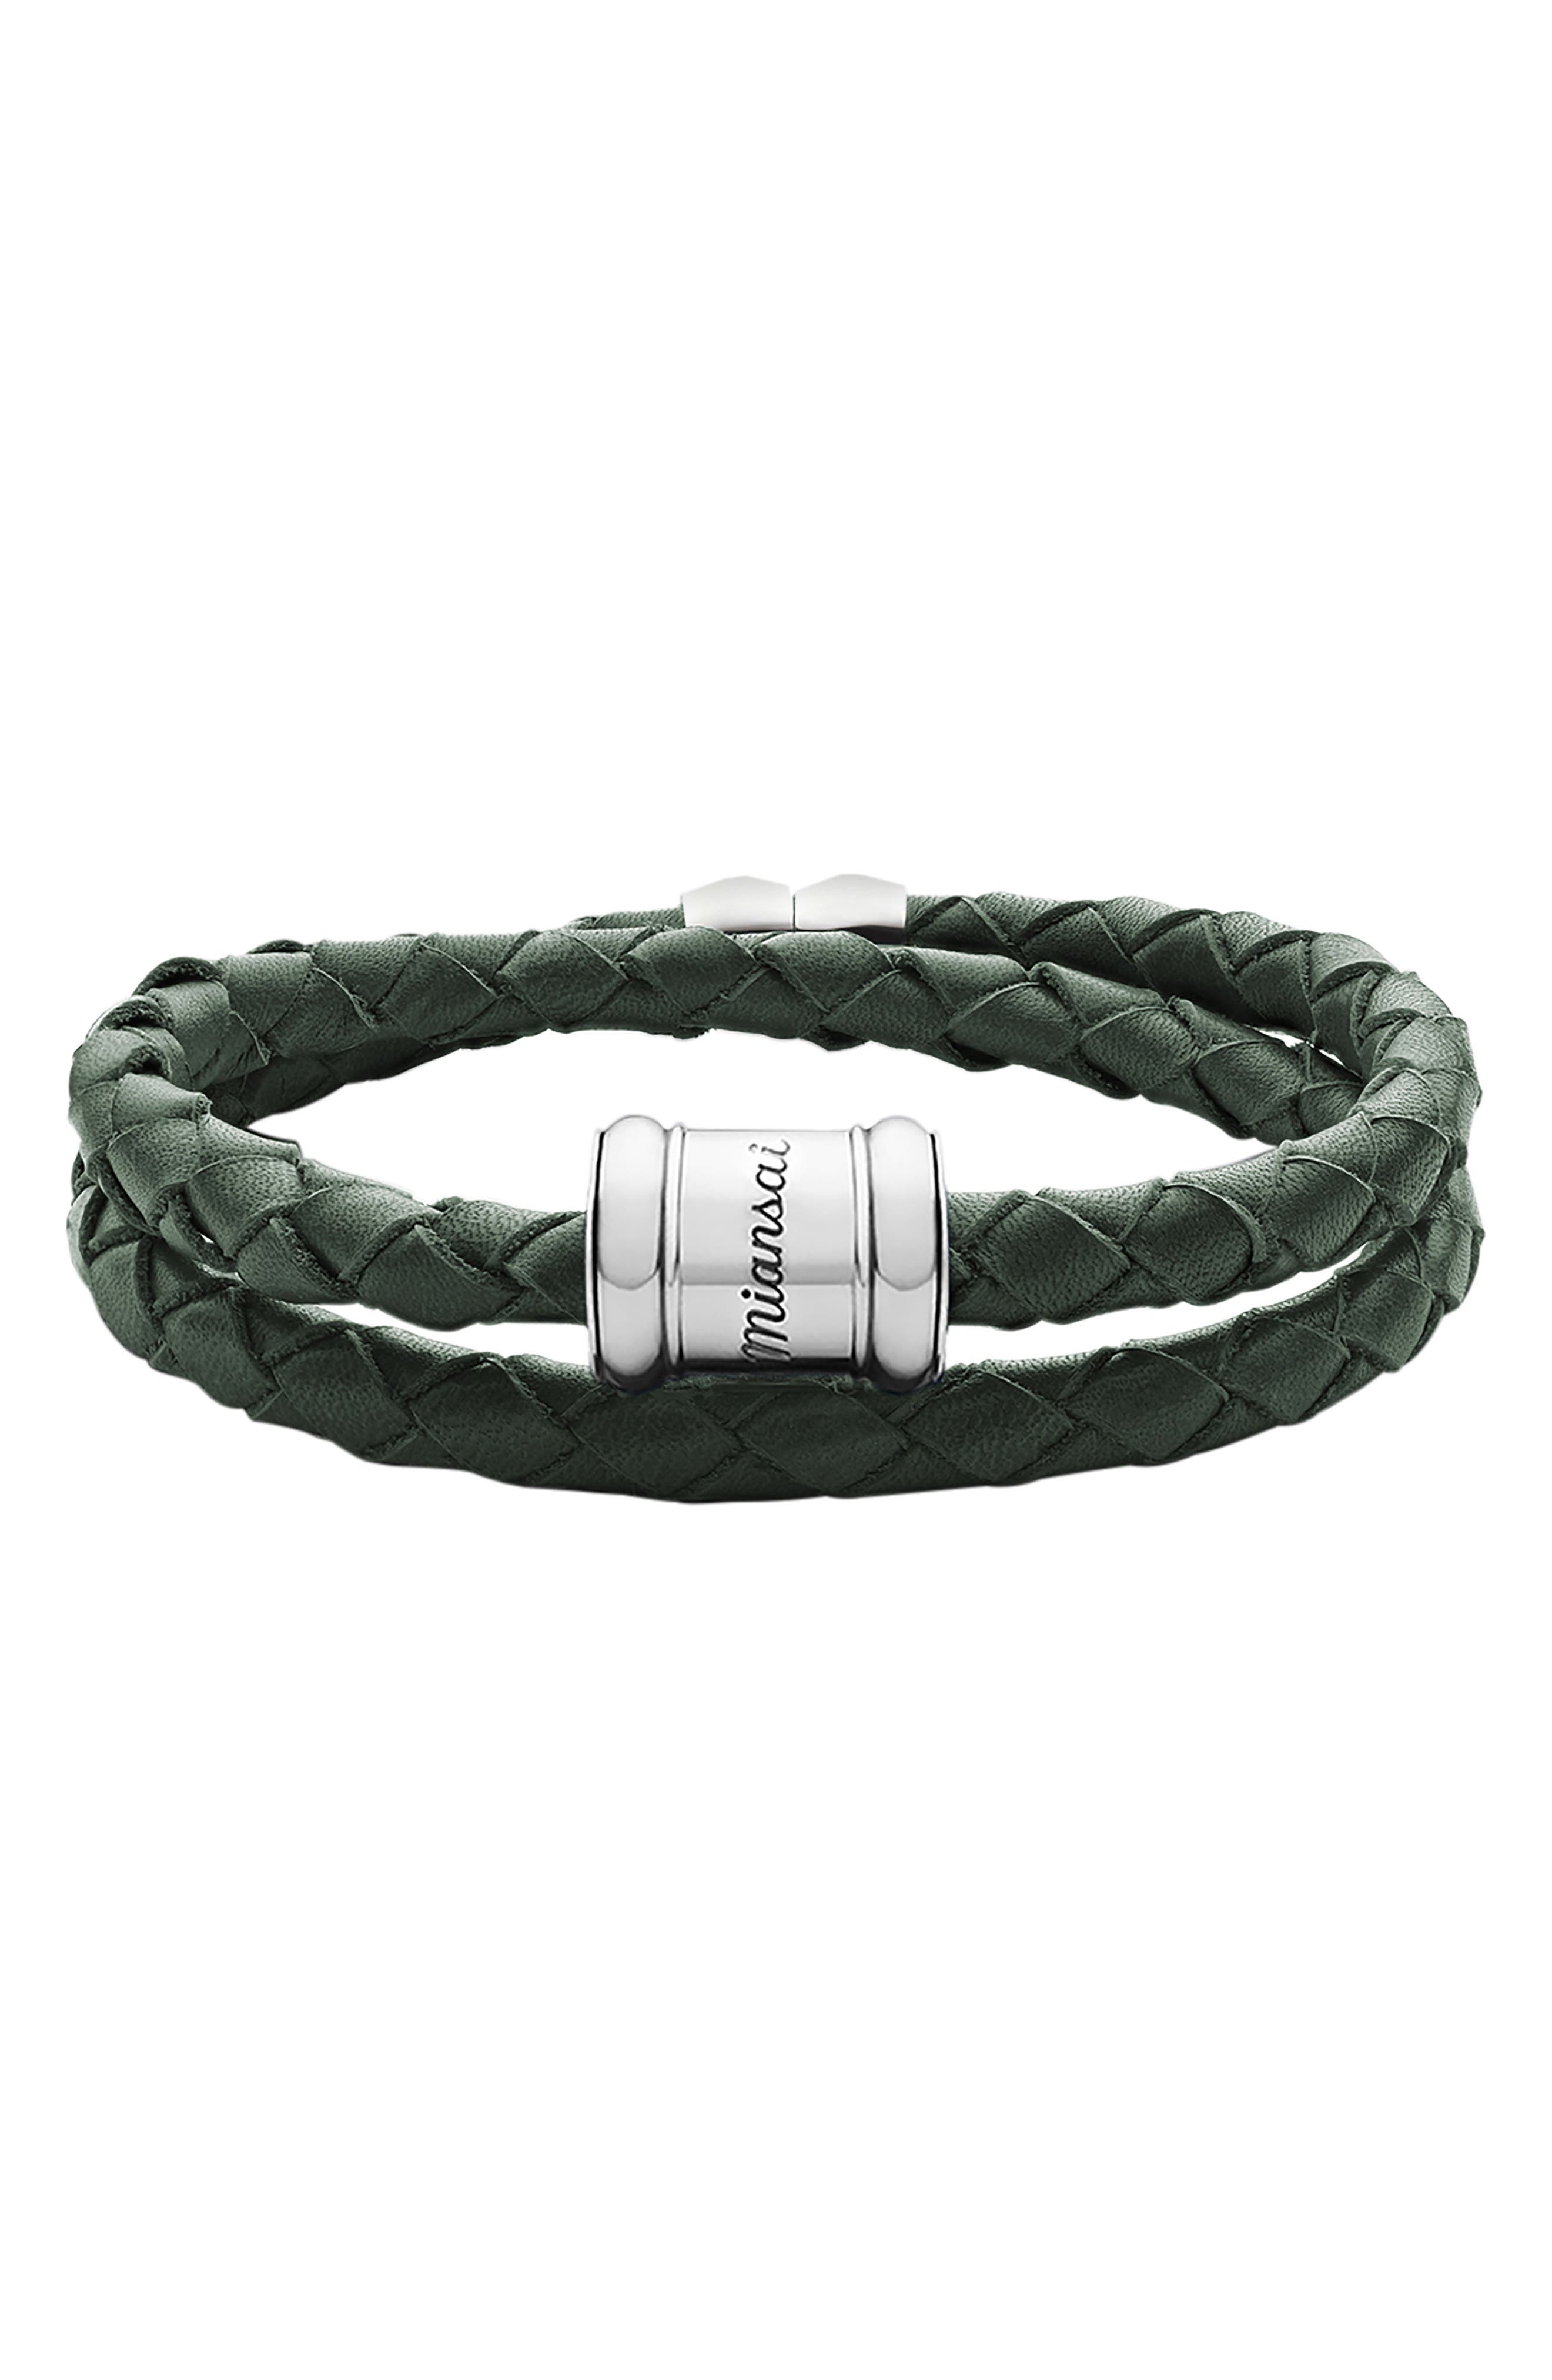 Braided Leather Bracelet,                             Main thumbnail 1, color,                             302